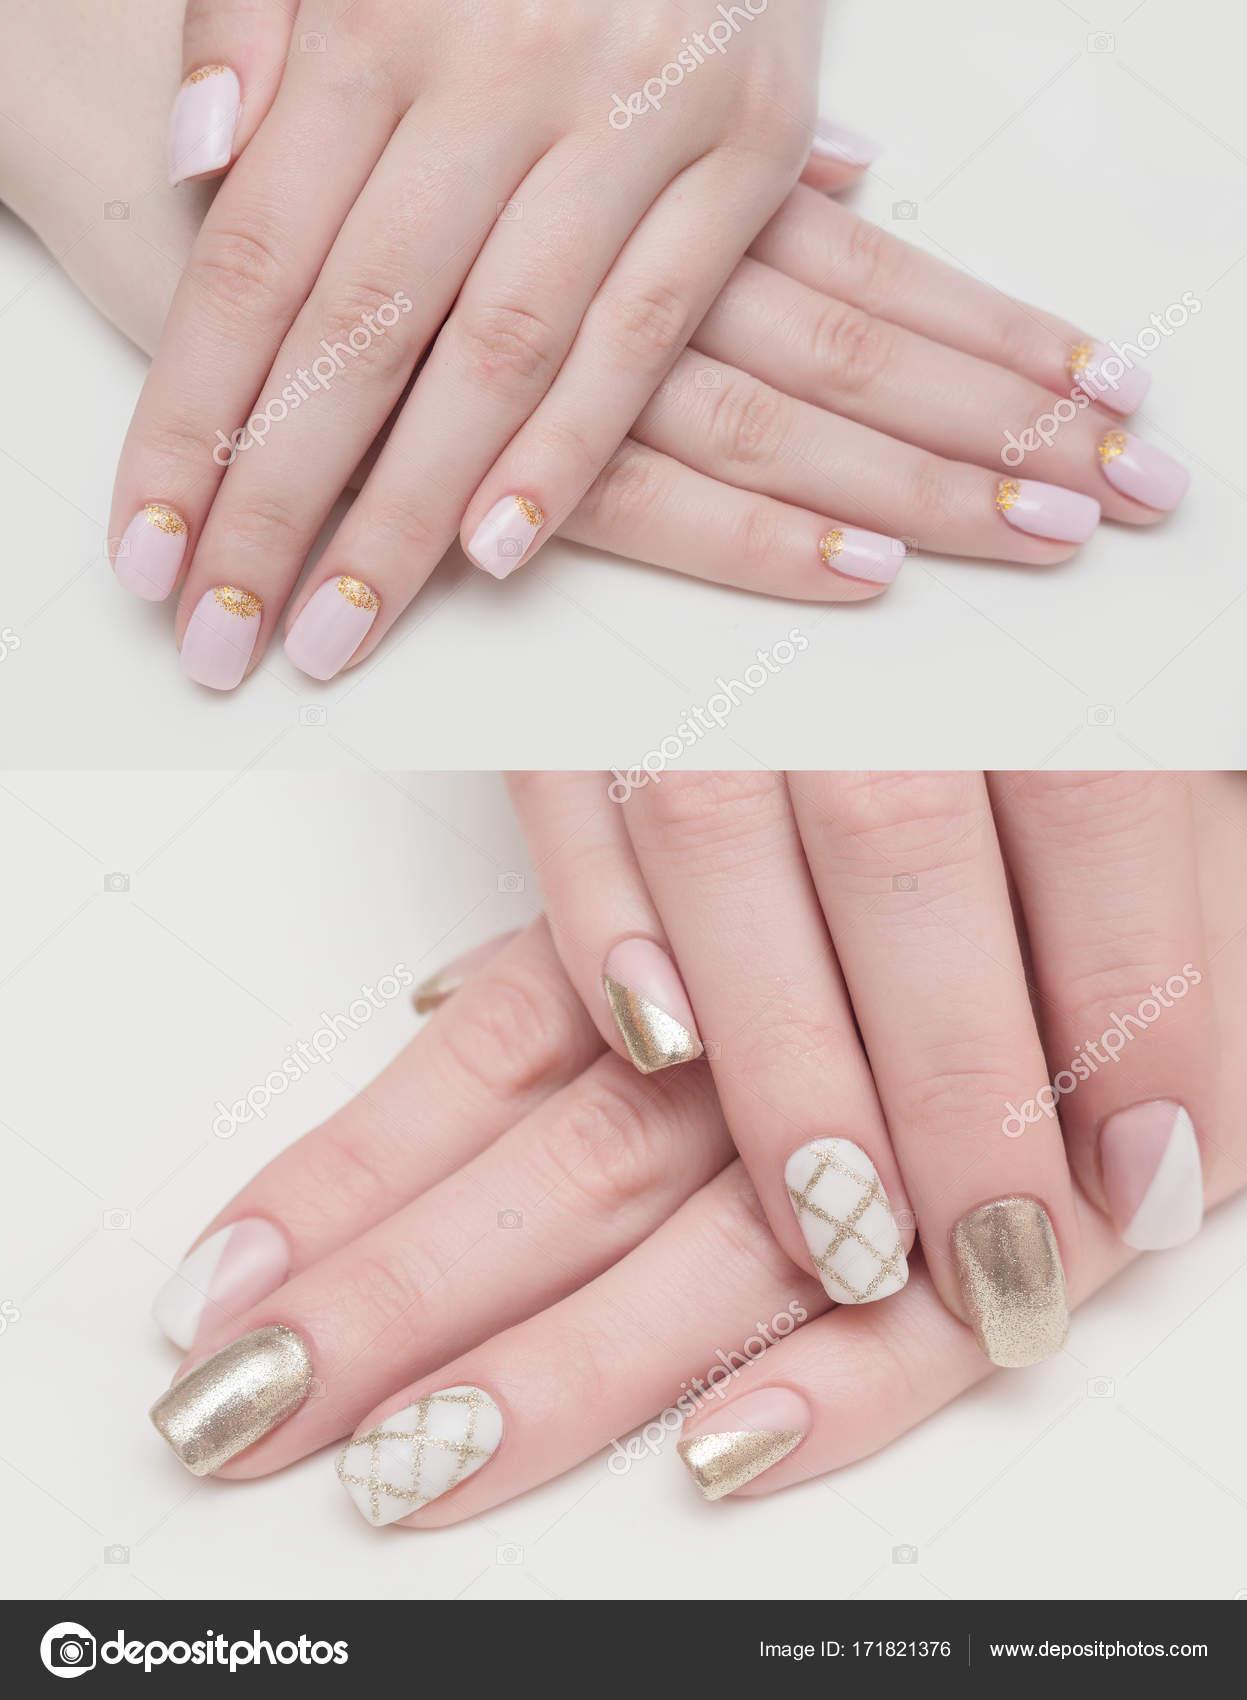 Sehr schöner Silber Metallic Nägel Closeup Gel, Acryl — Stockfoto ...